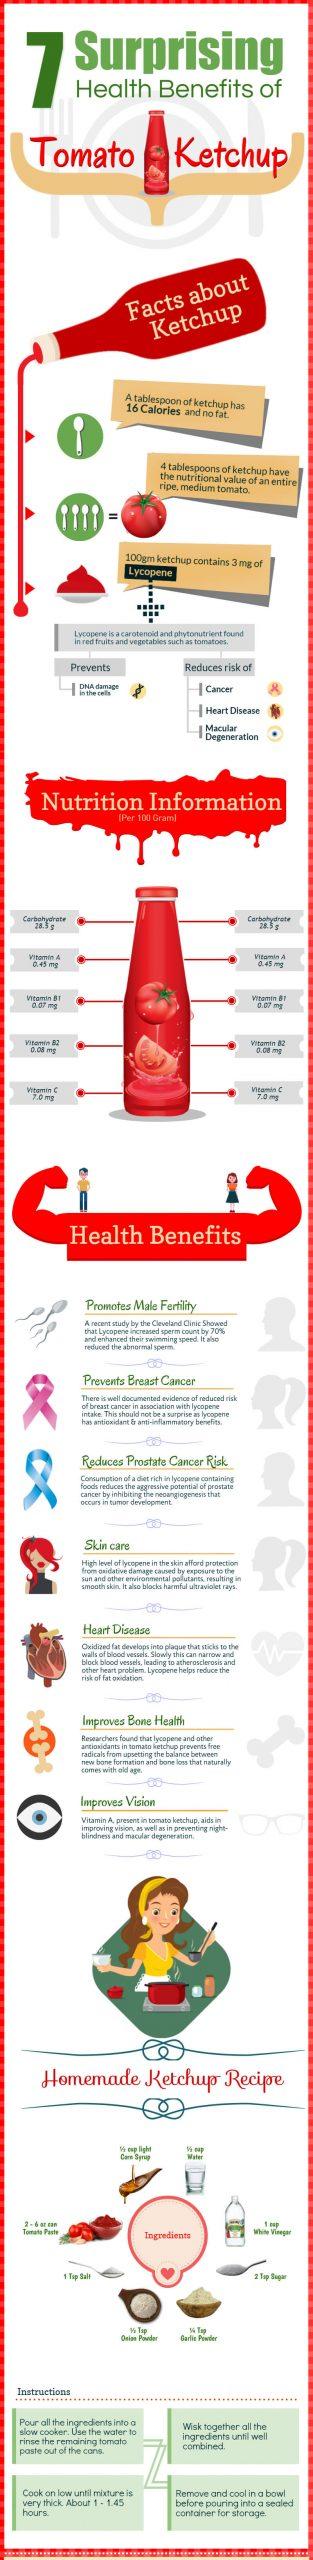 benefits of tomato ketchup